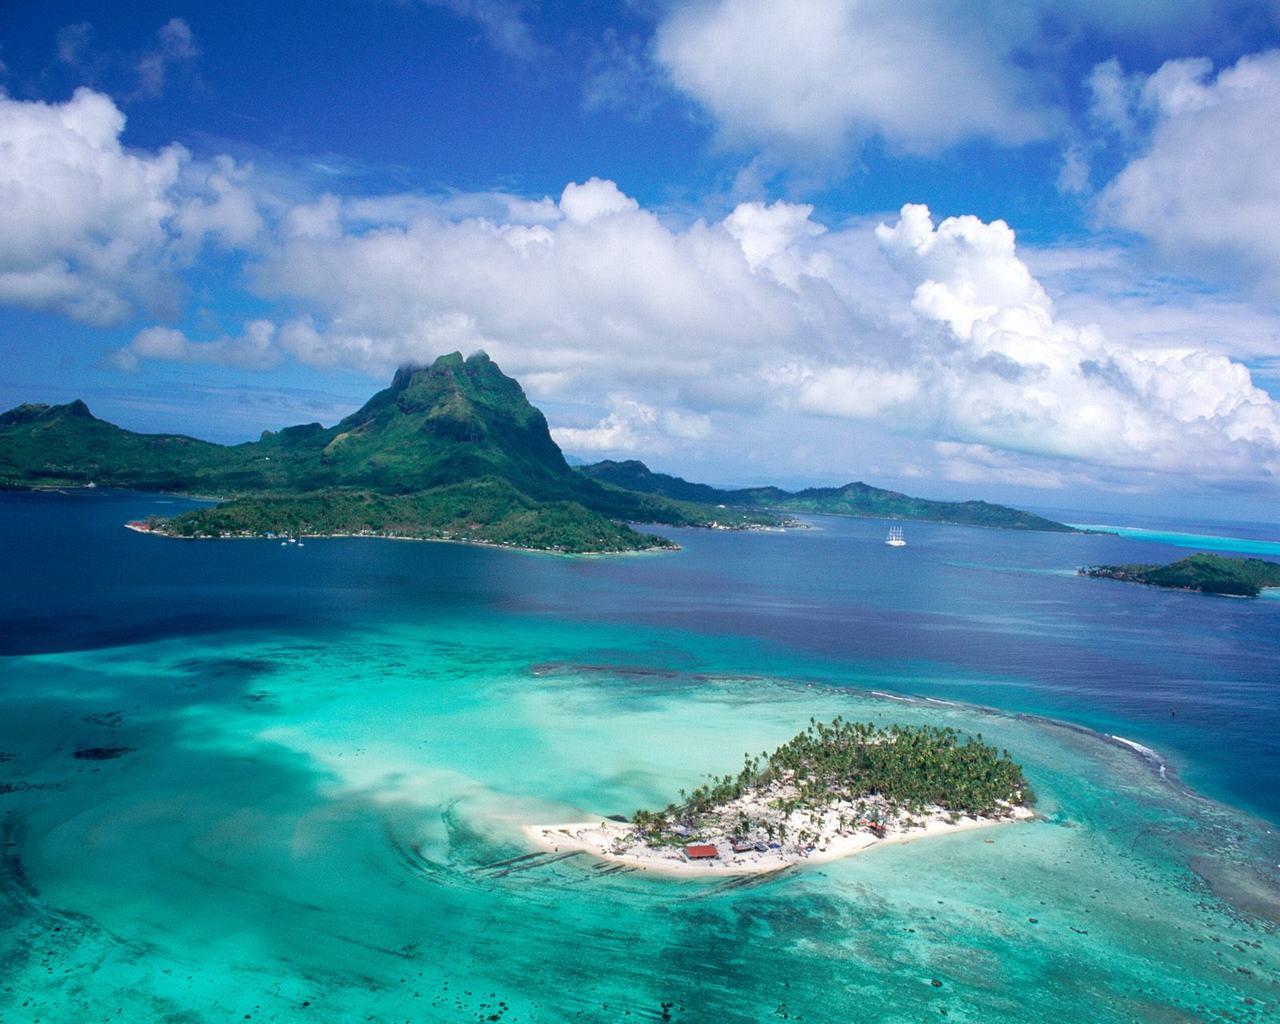 Tropical Island Desktop Wallpaper 1280x1024